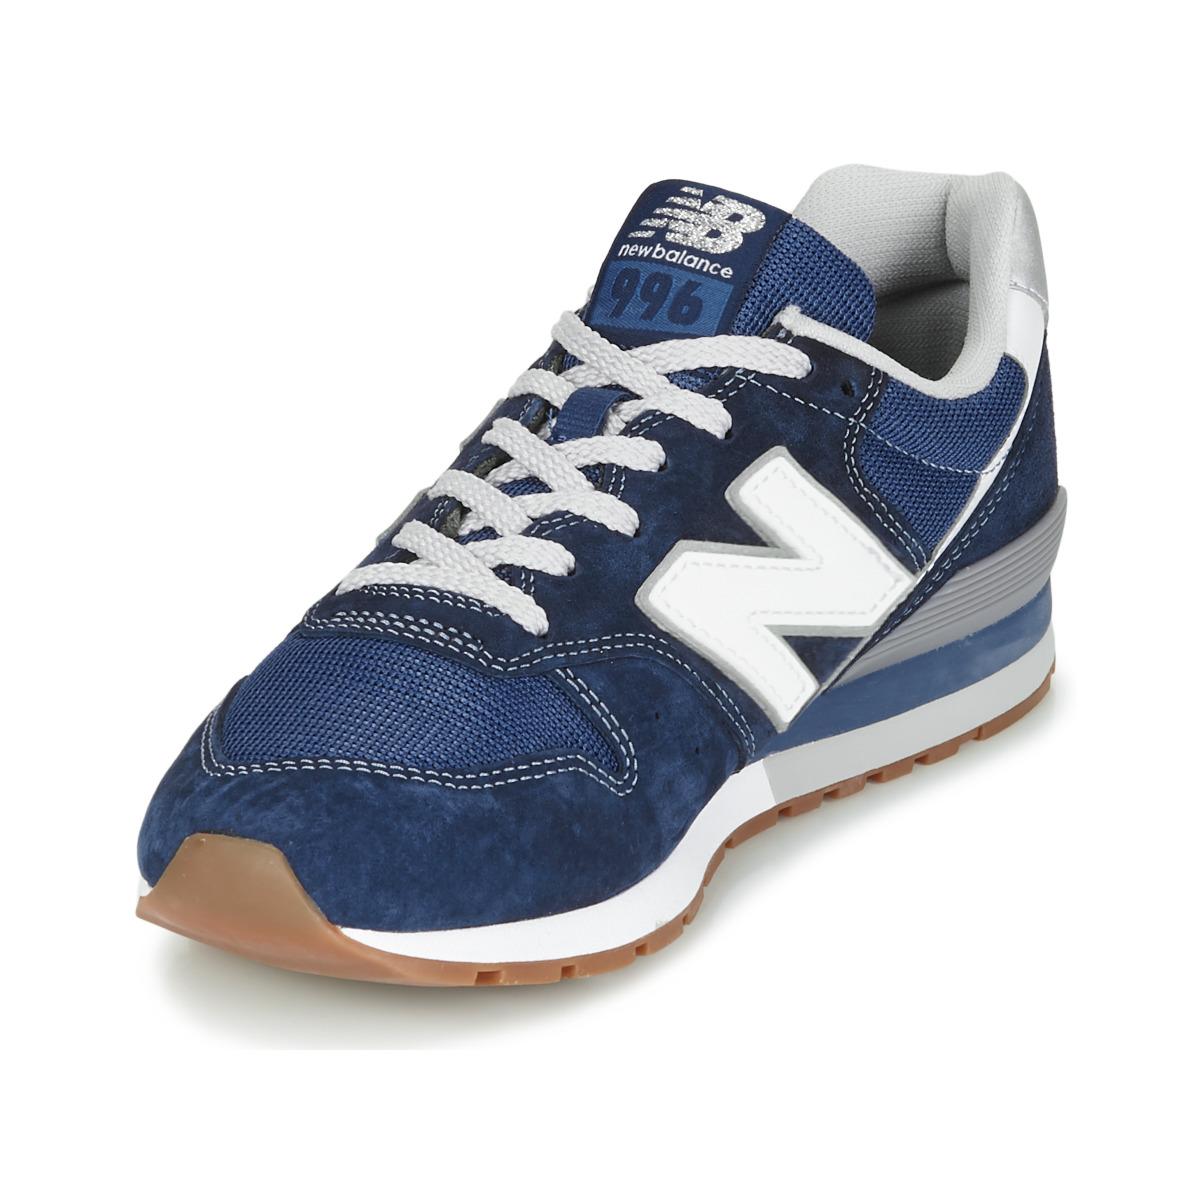 New Balance 996 Blu Uomo 16697097 Consegna Gratuita